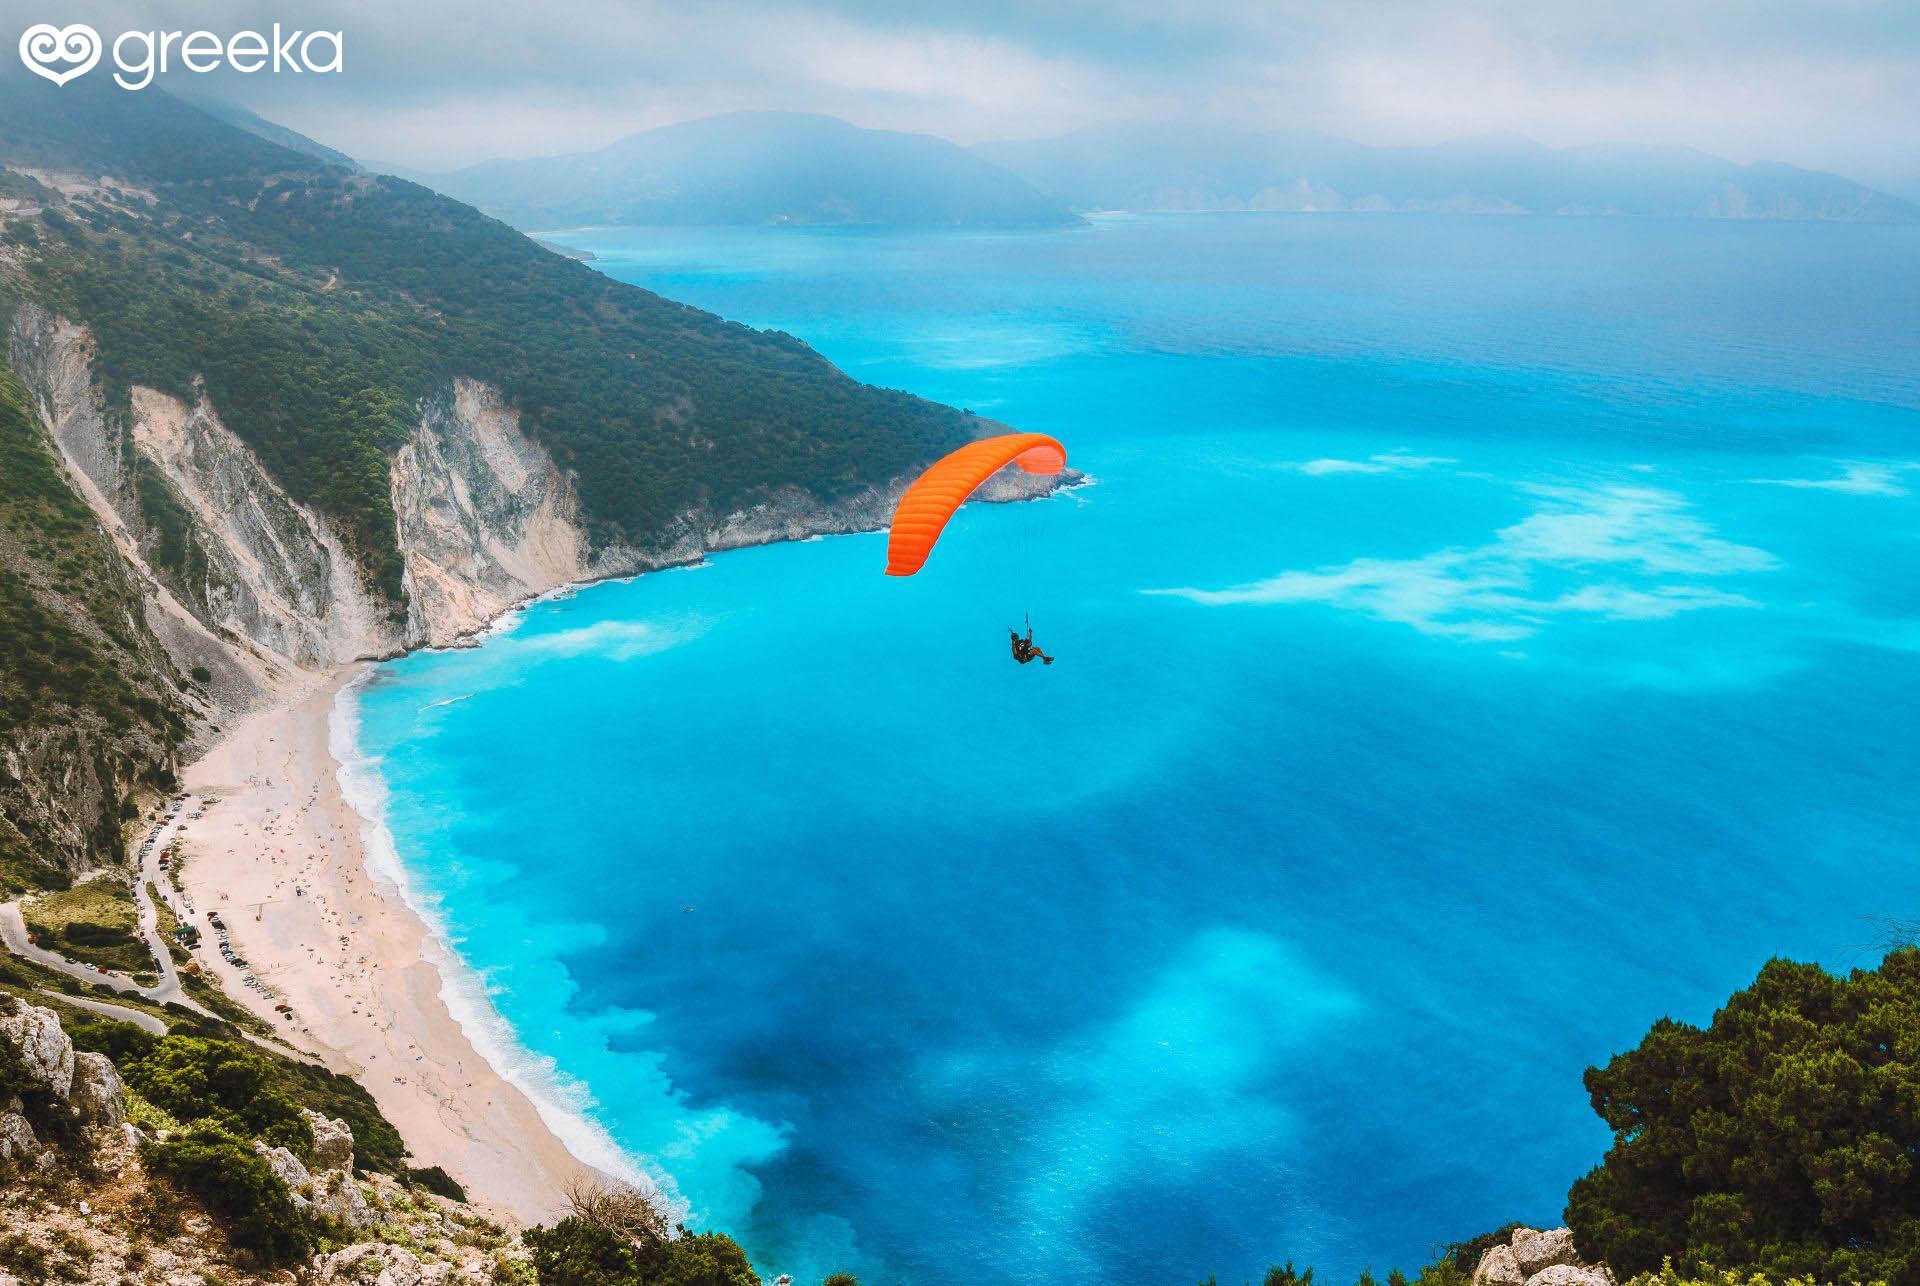 Greece sports: Paragliding